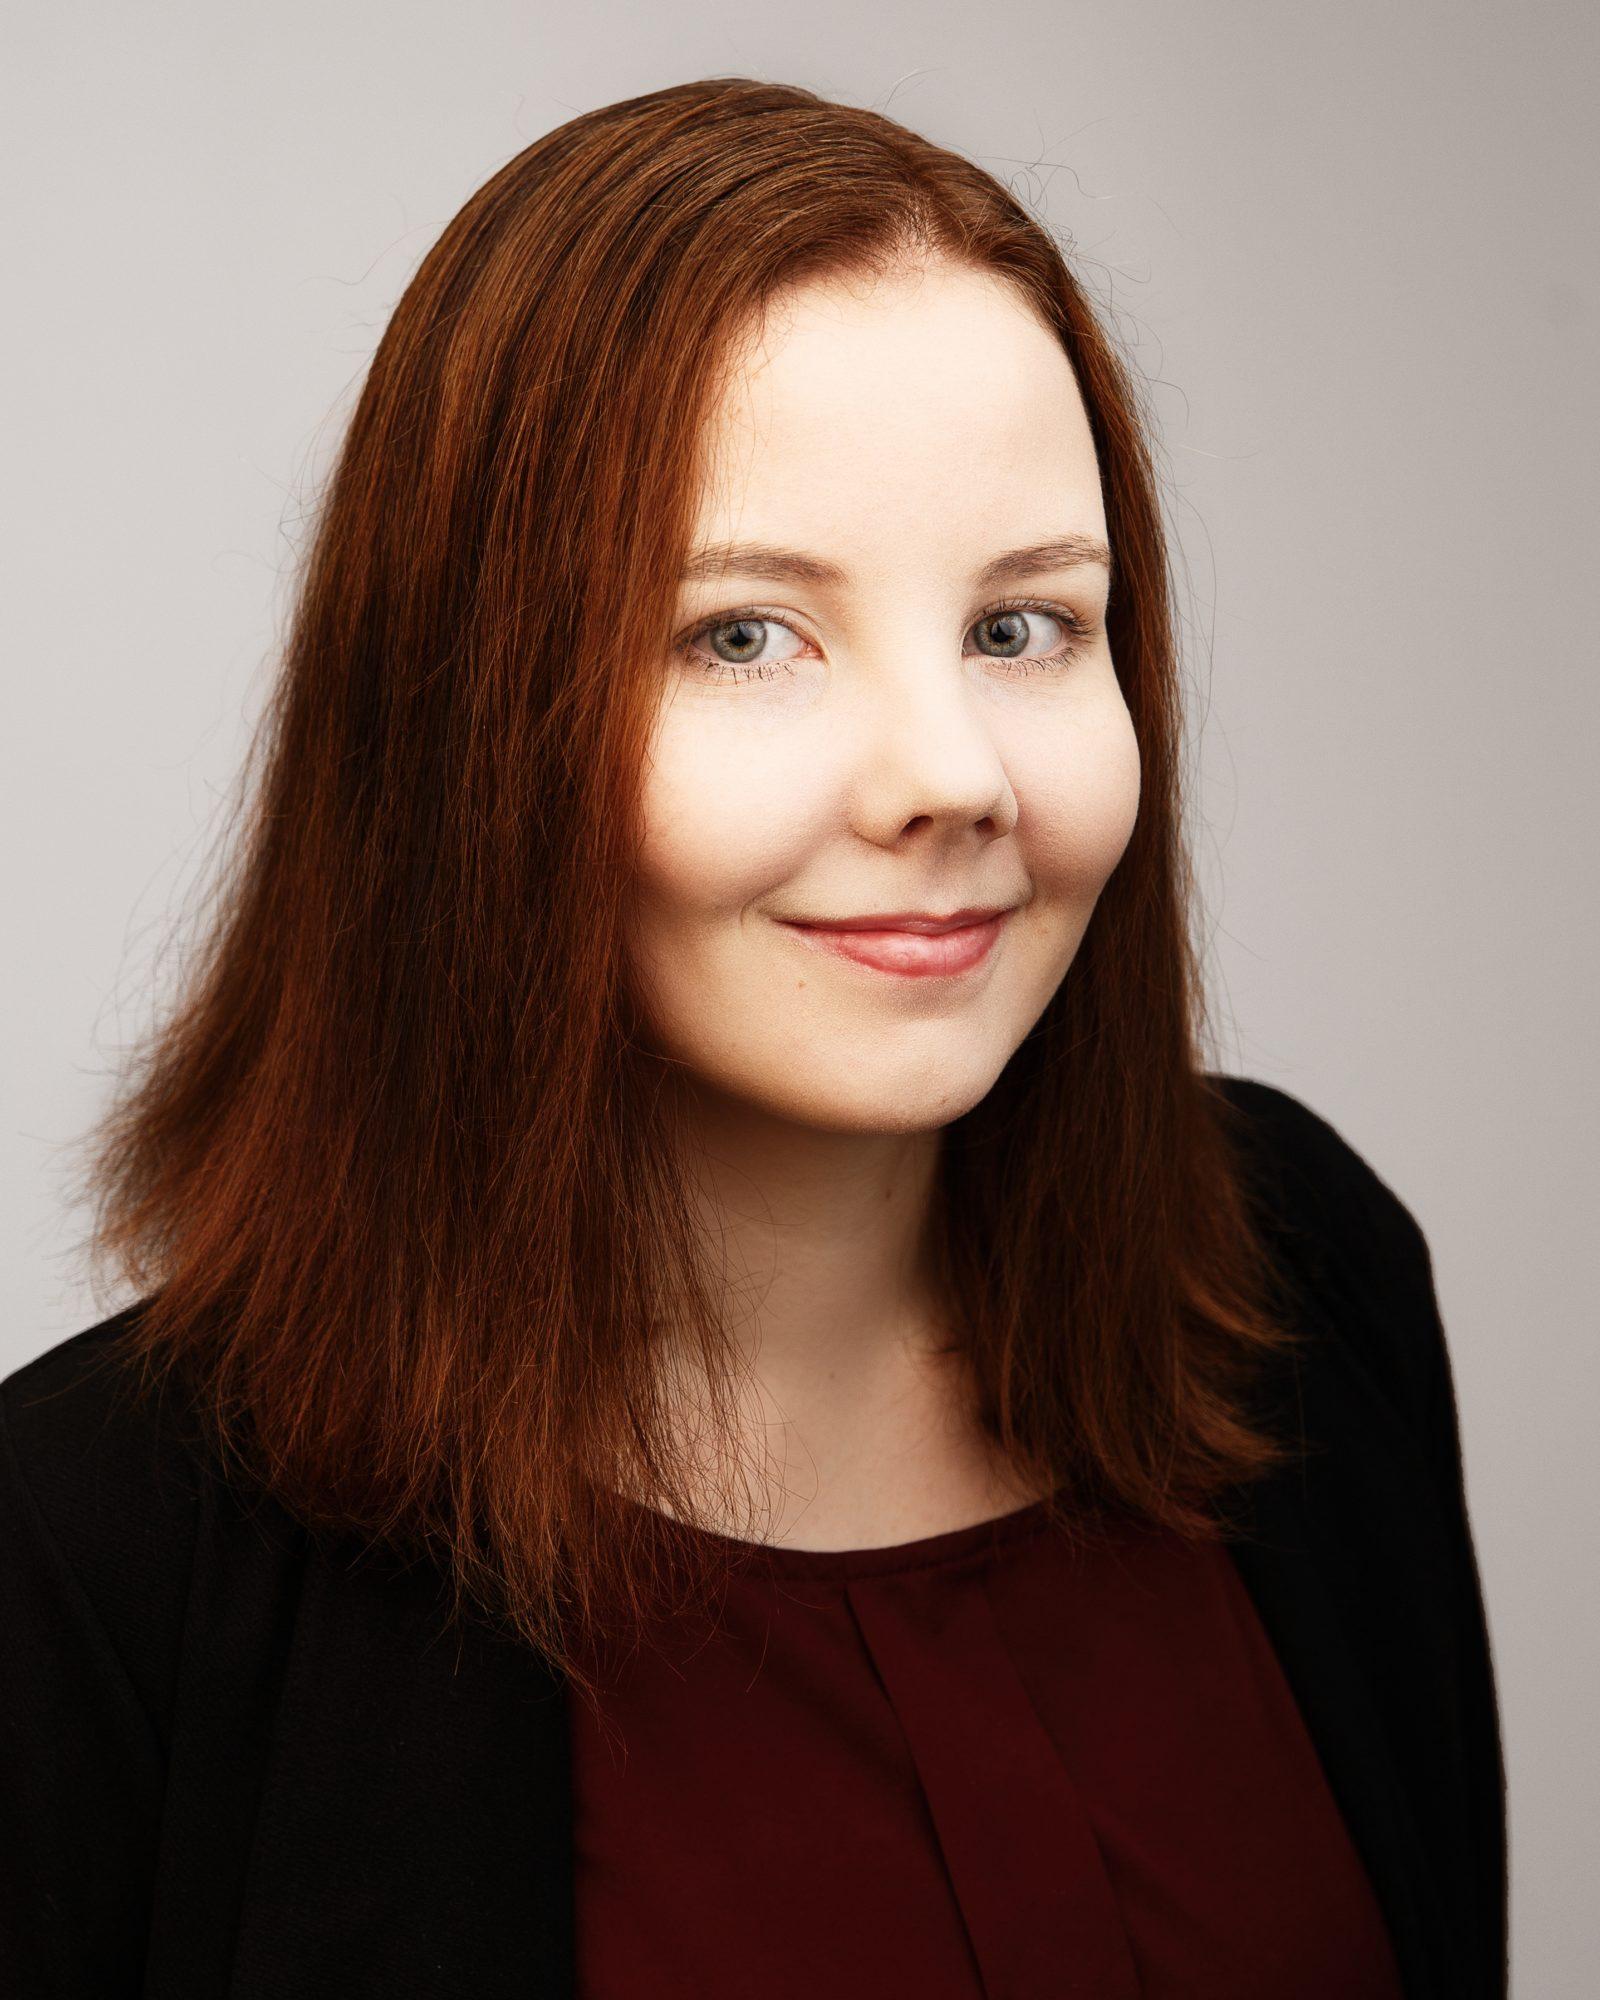 Emilia Kauppi